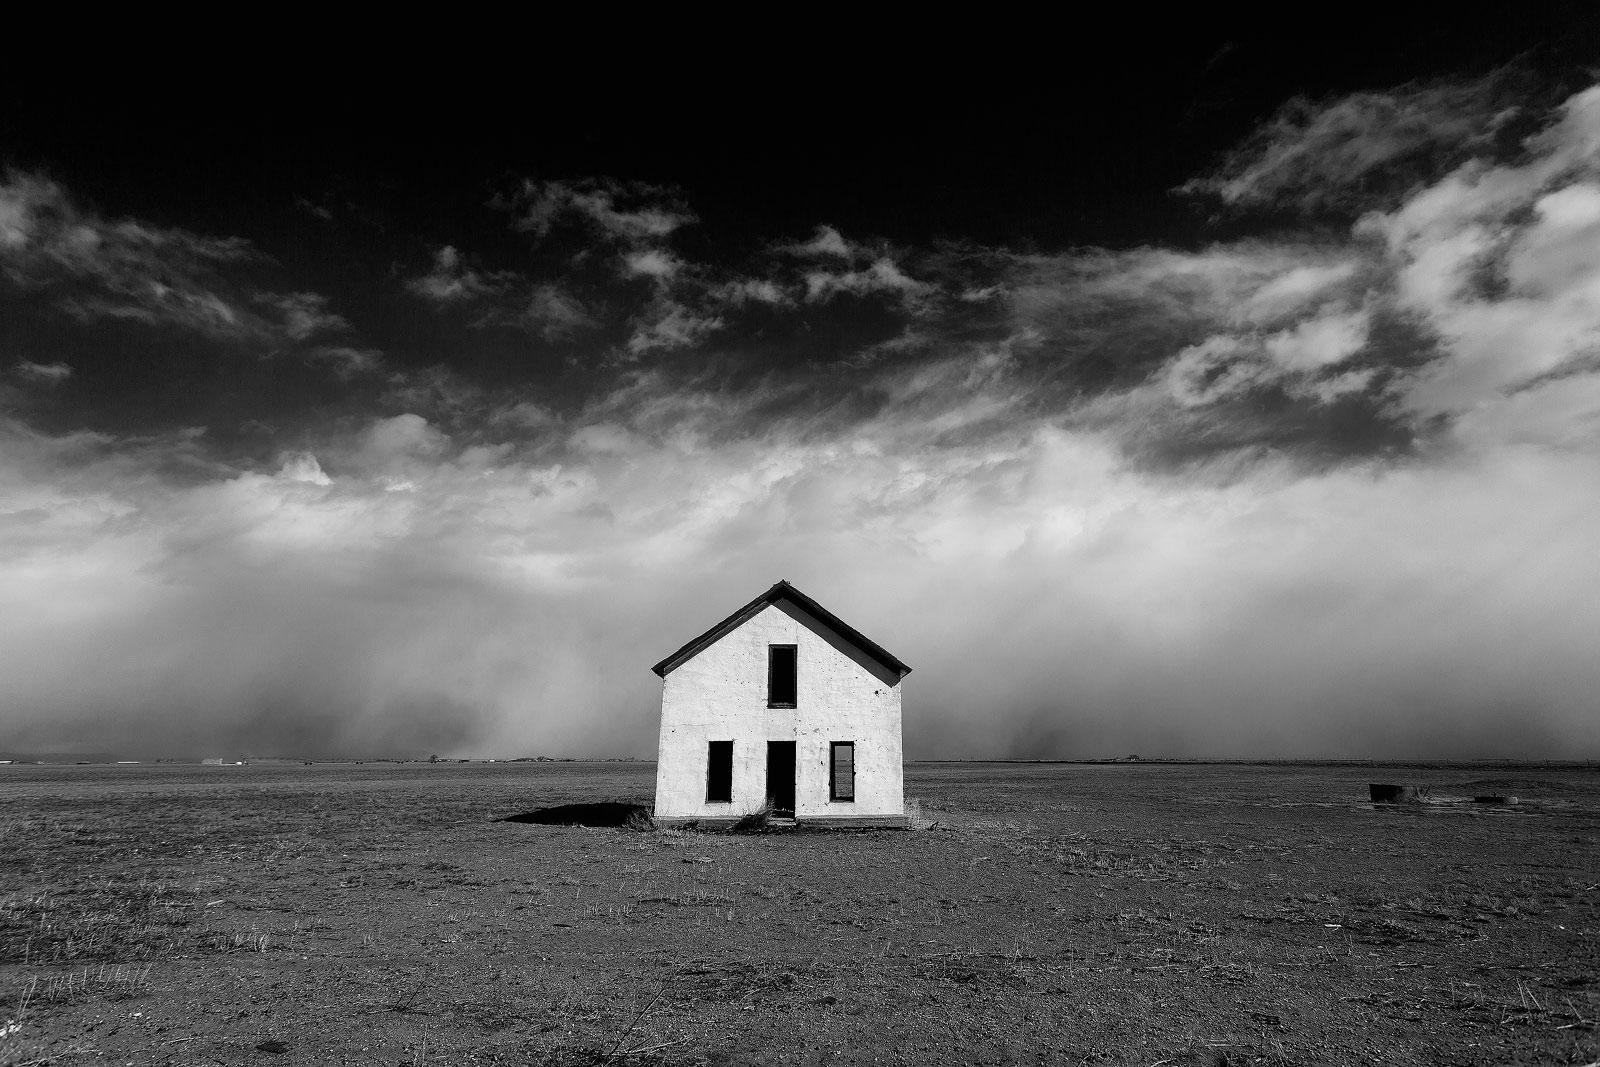 abandoned-house-sand-dunes-colorado.jpg